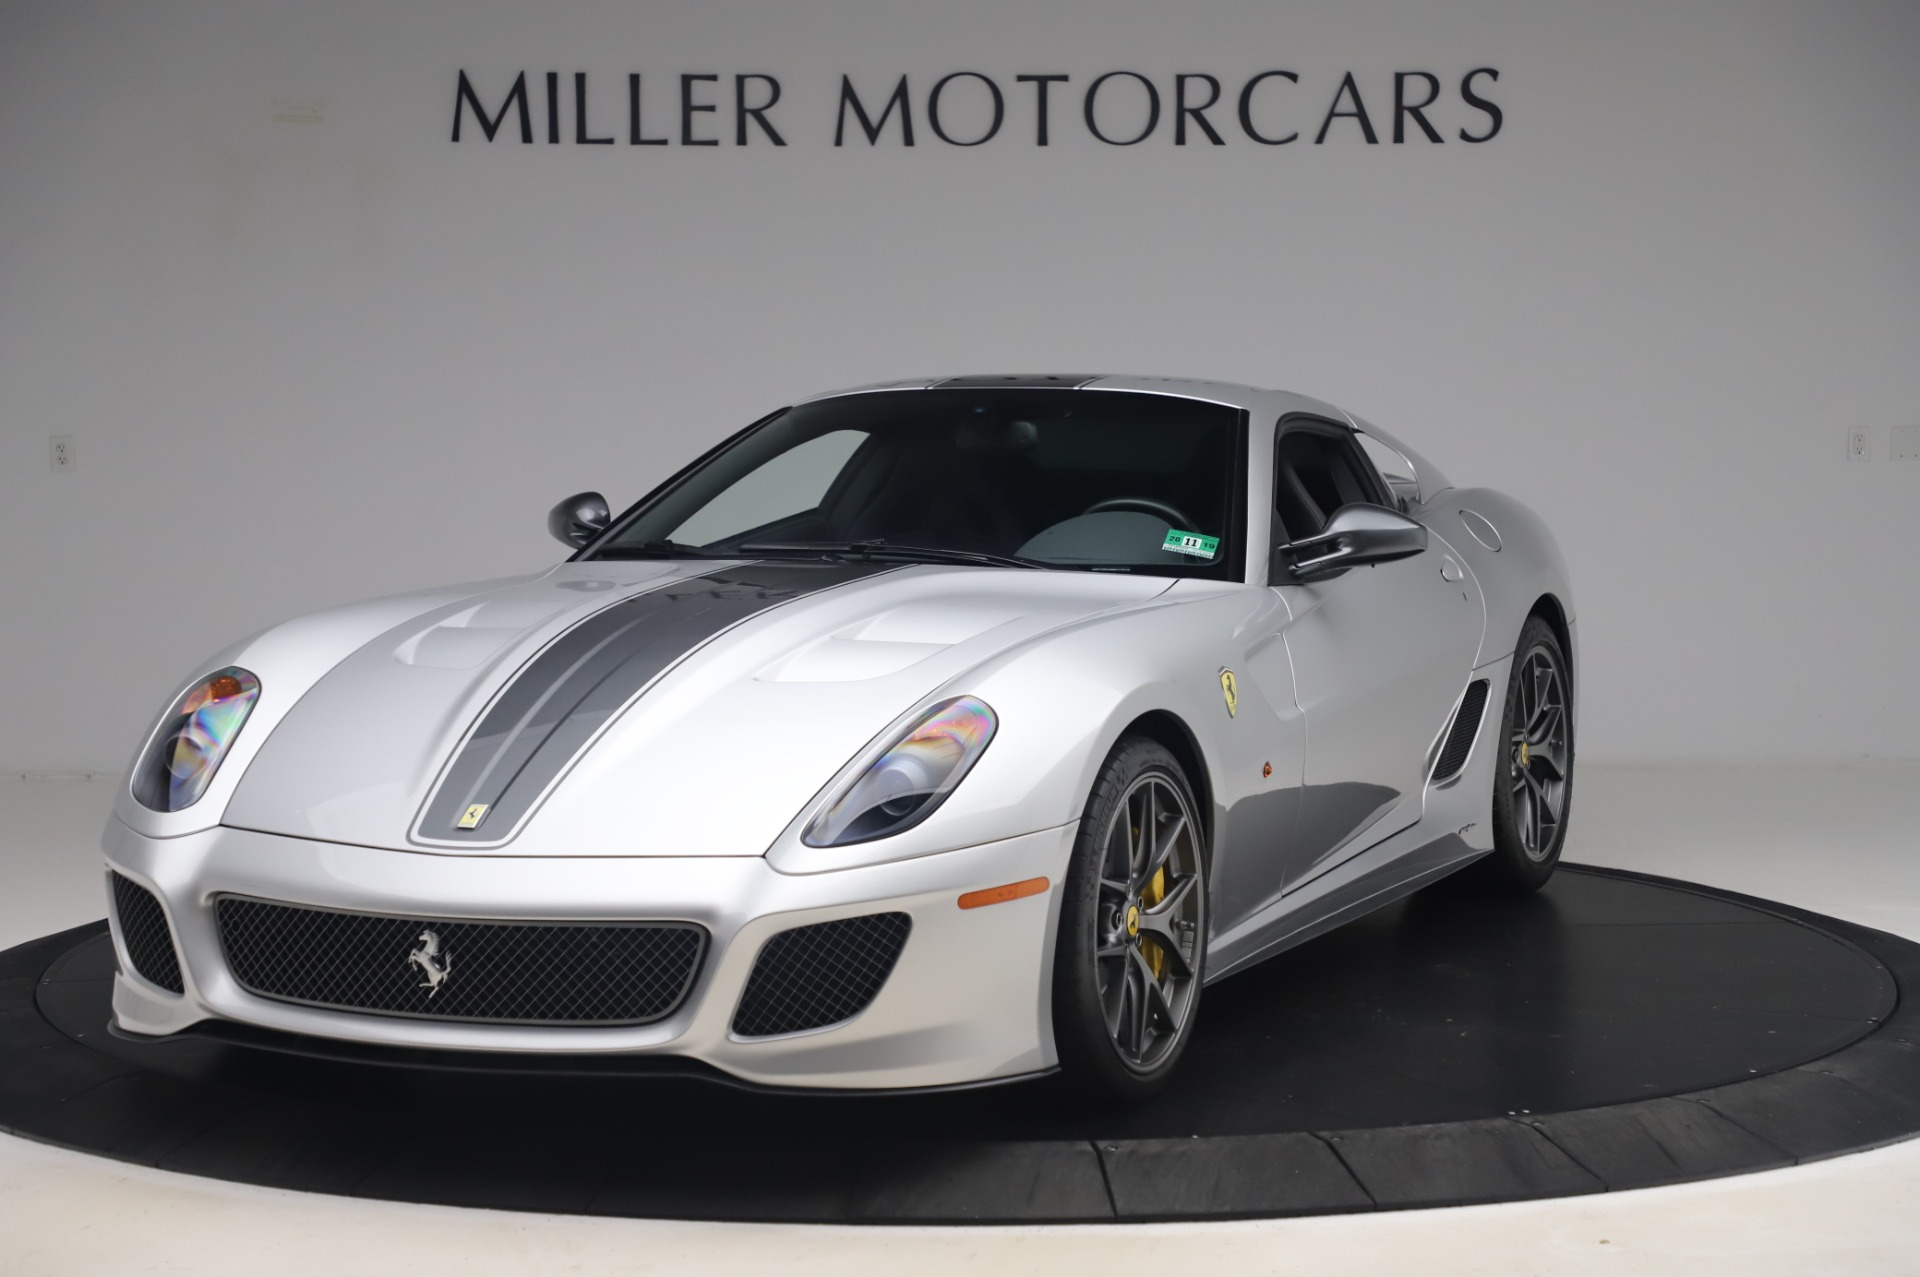 Used 2011 Ferrari 599 GTO for sale Sold at McLaren Greenwich in Greenwich CT 06830 1